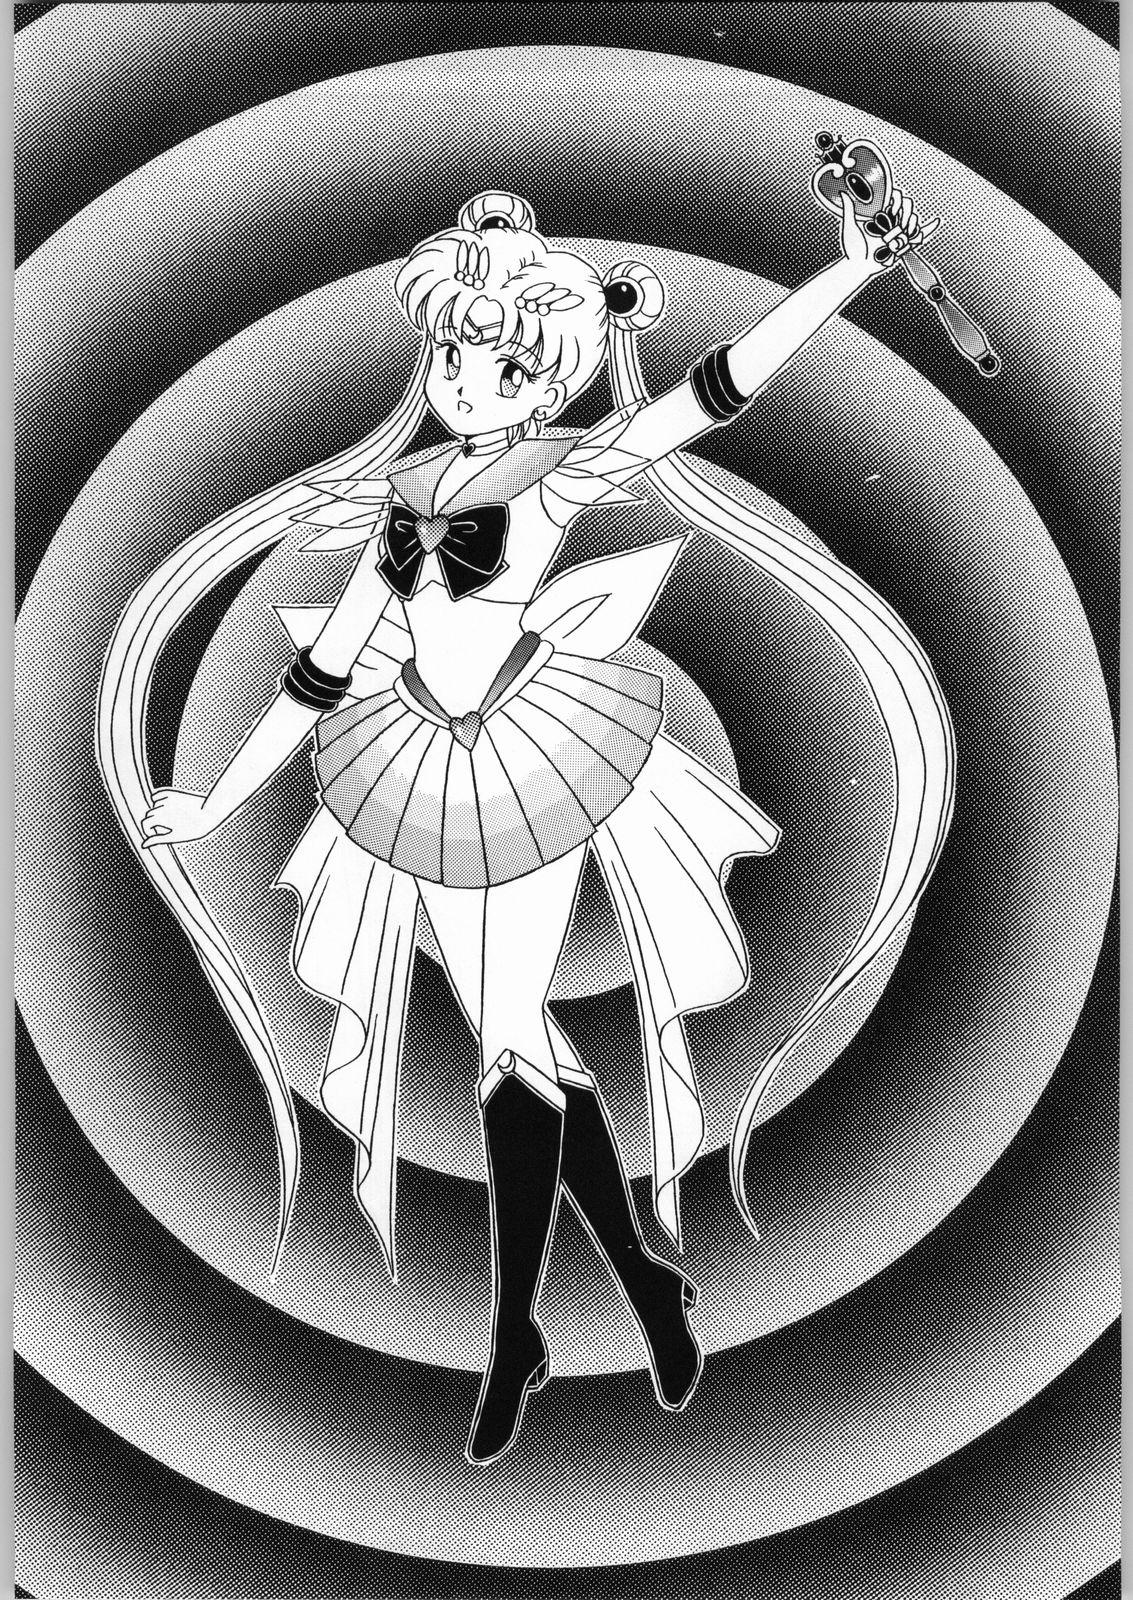 Dance of Princess 4 4